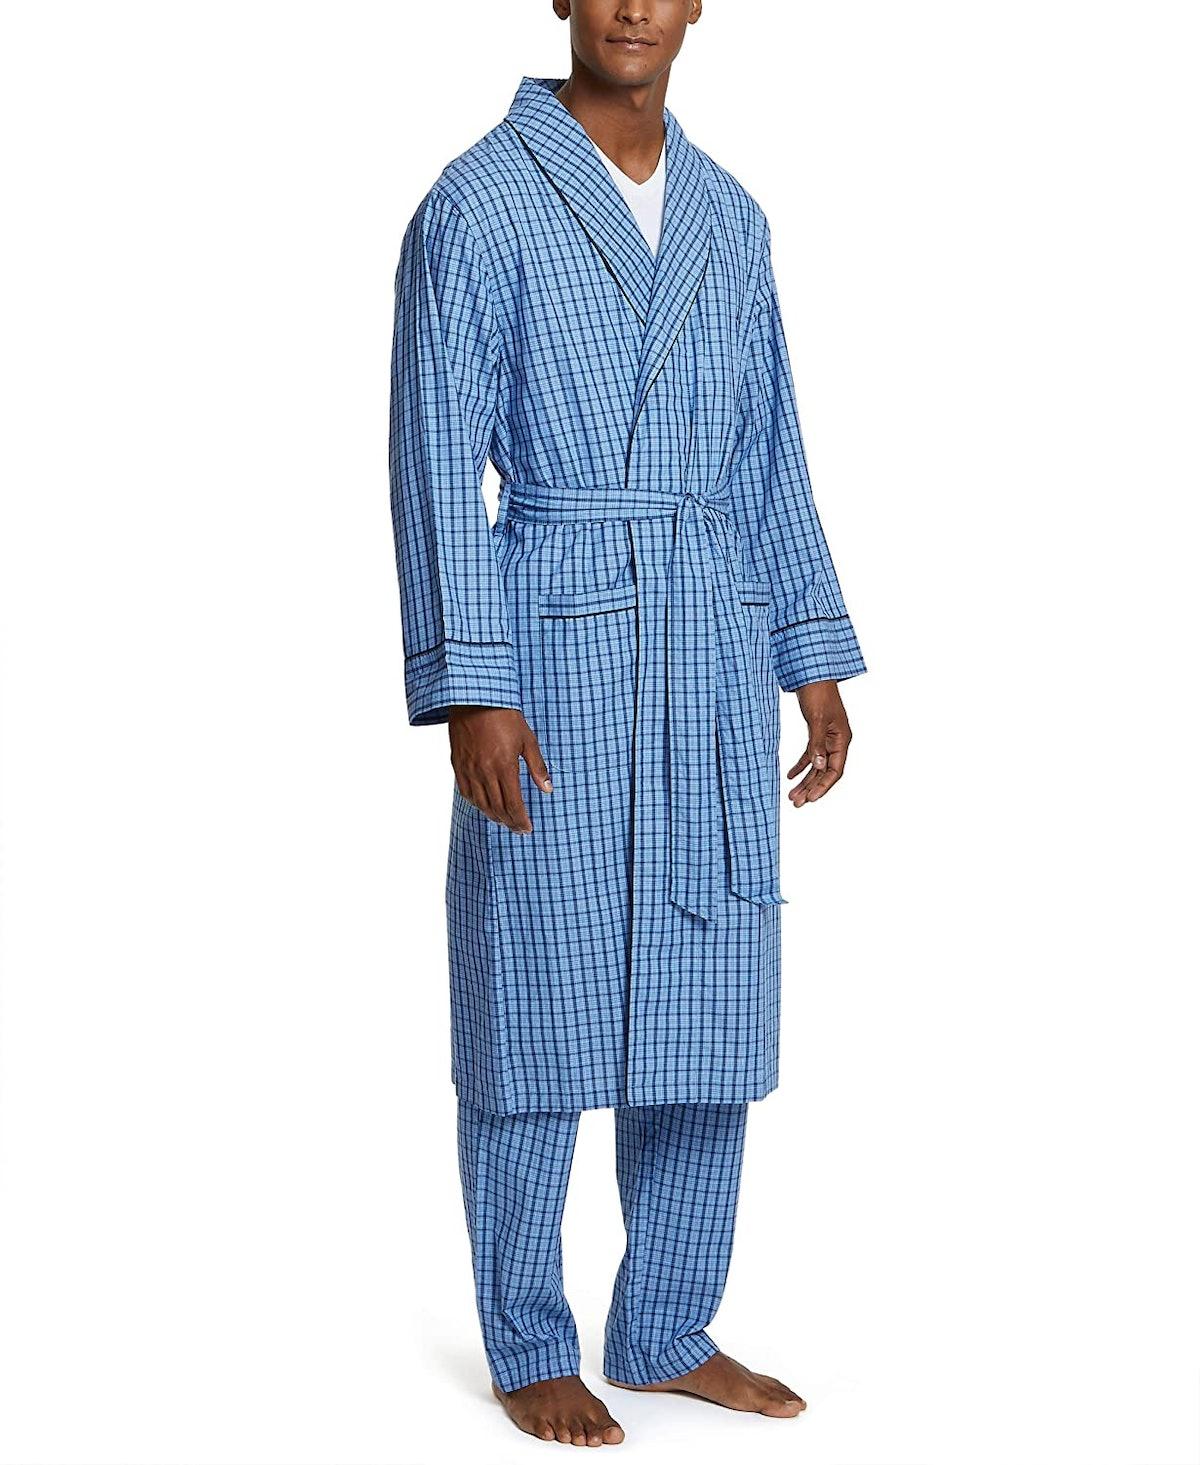 Nautica Men's Lightweight Cotton Woven Robe